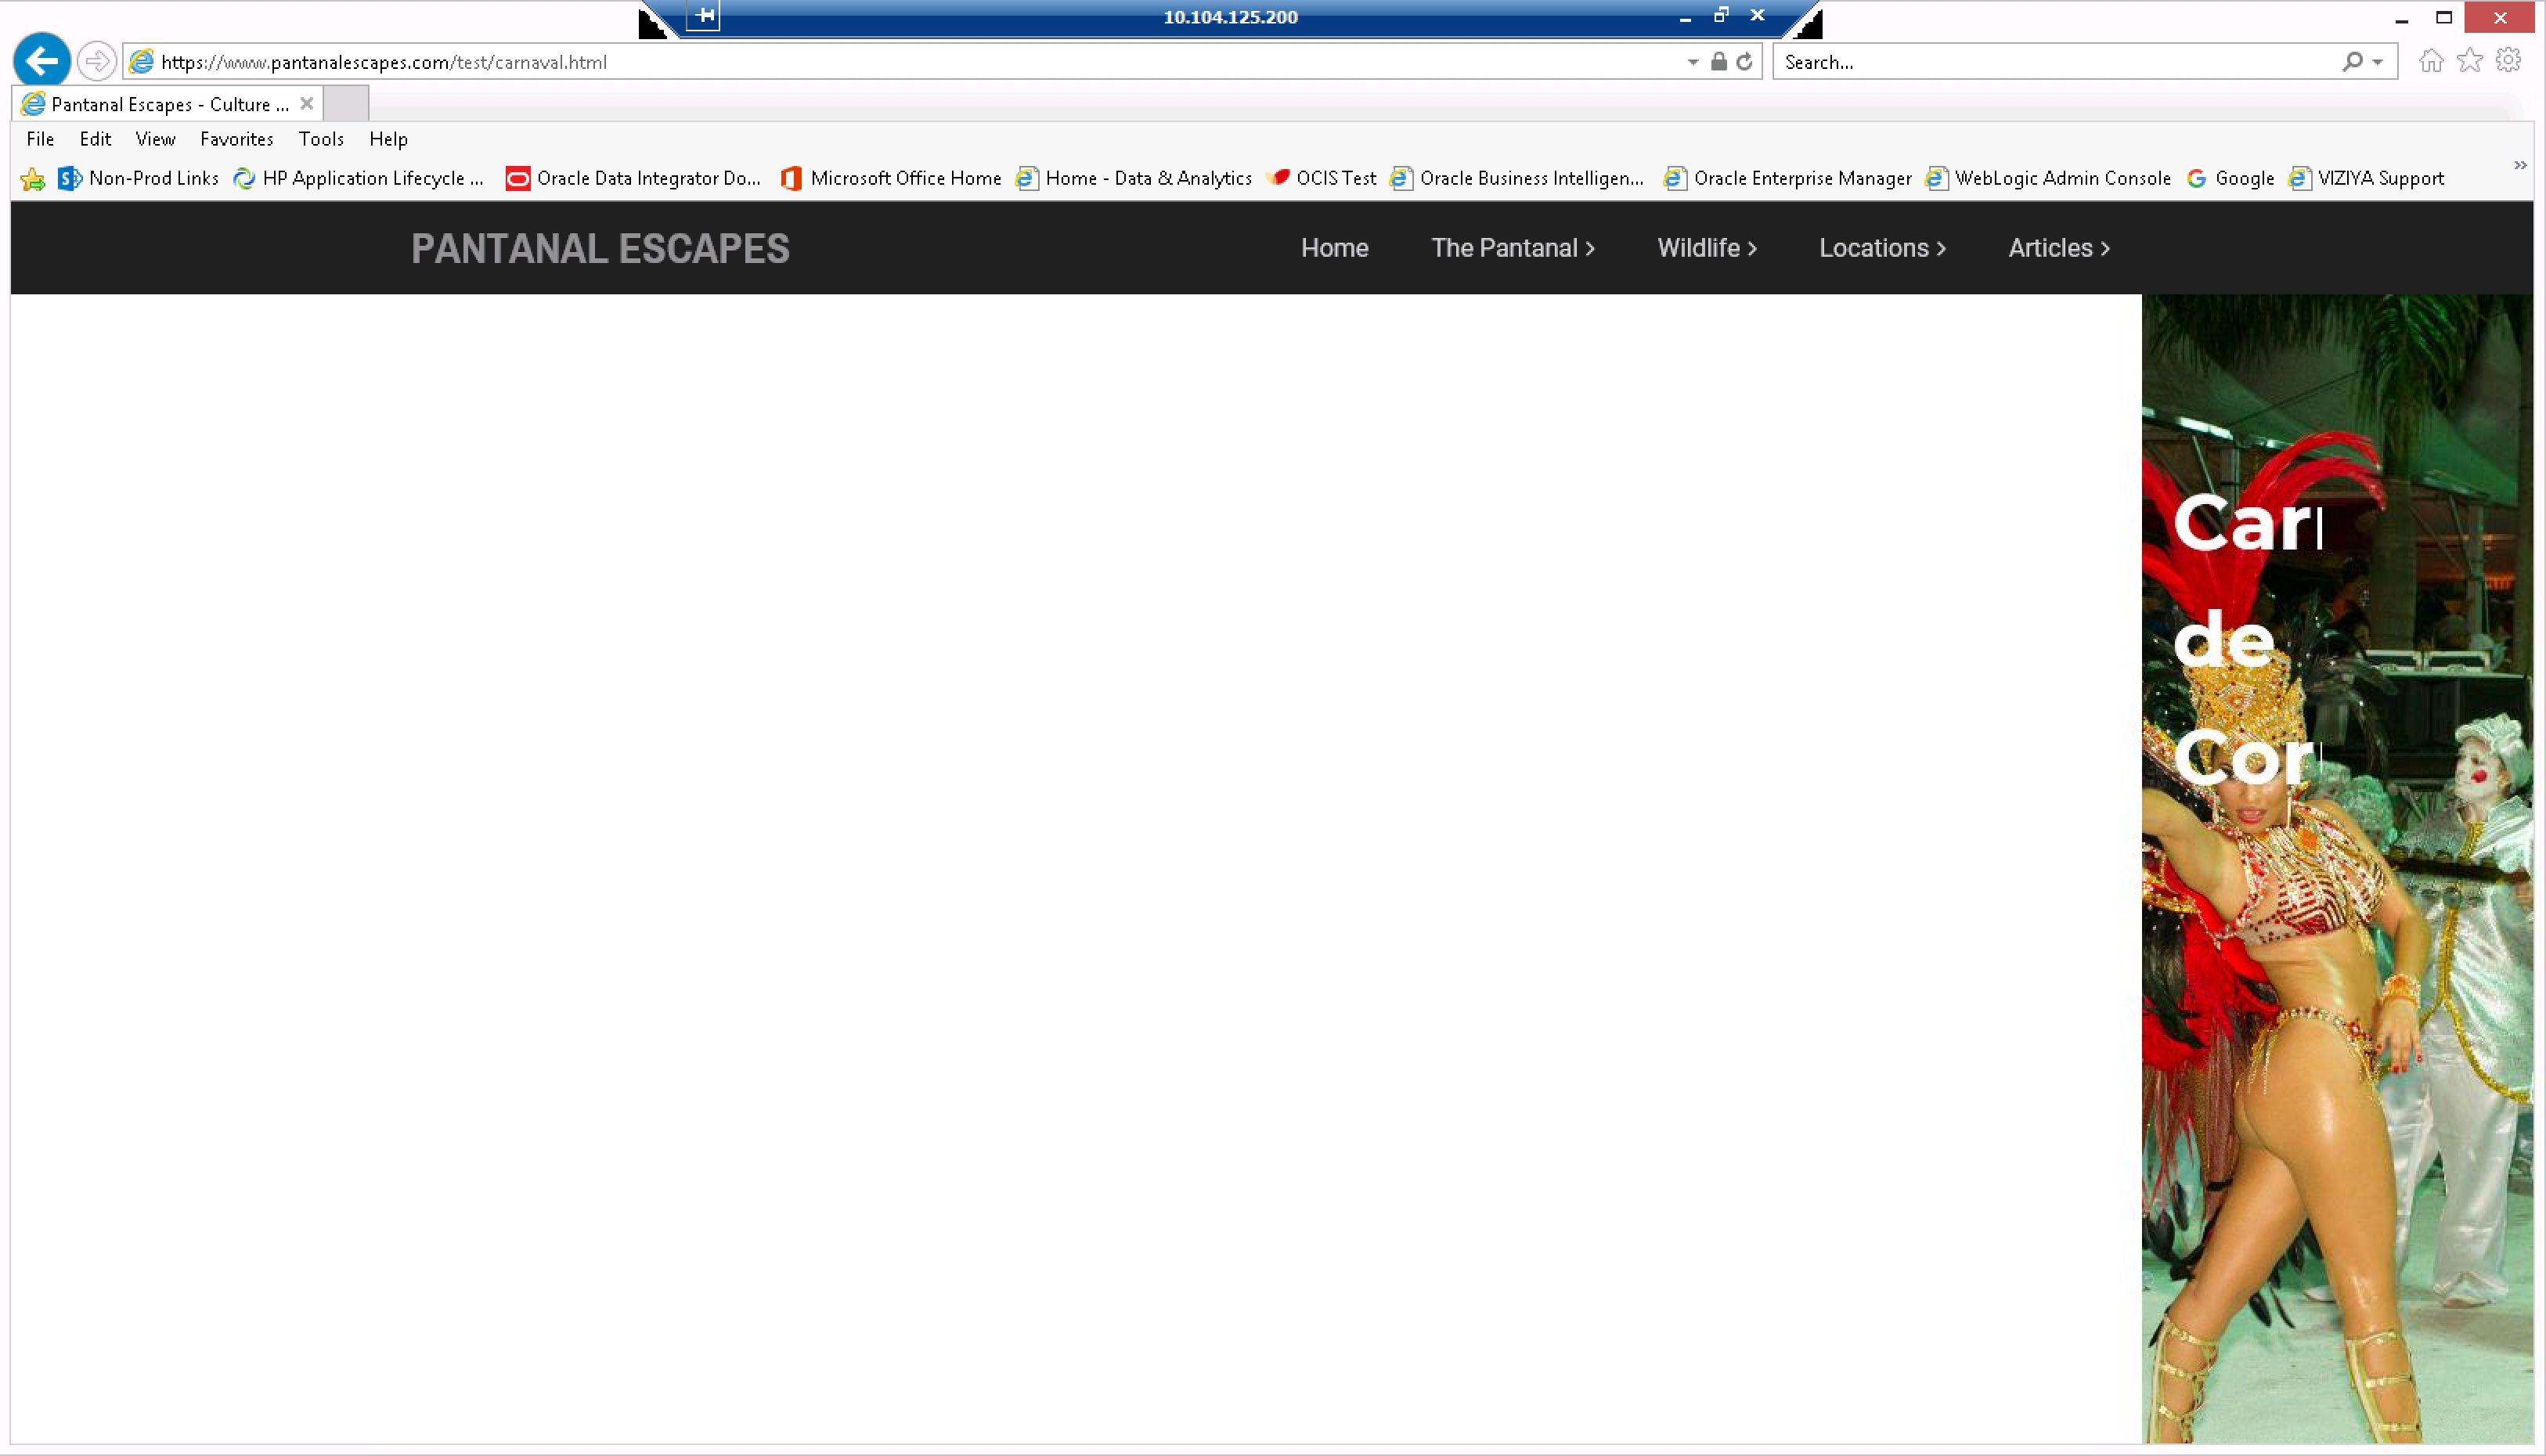 Mega Menu compatibility issues with Internet Explorer